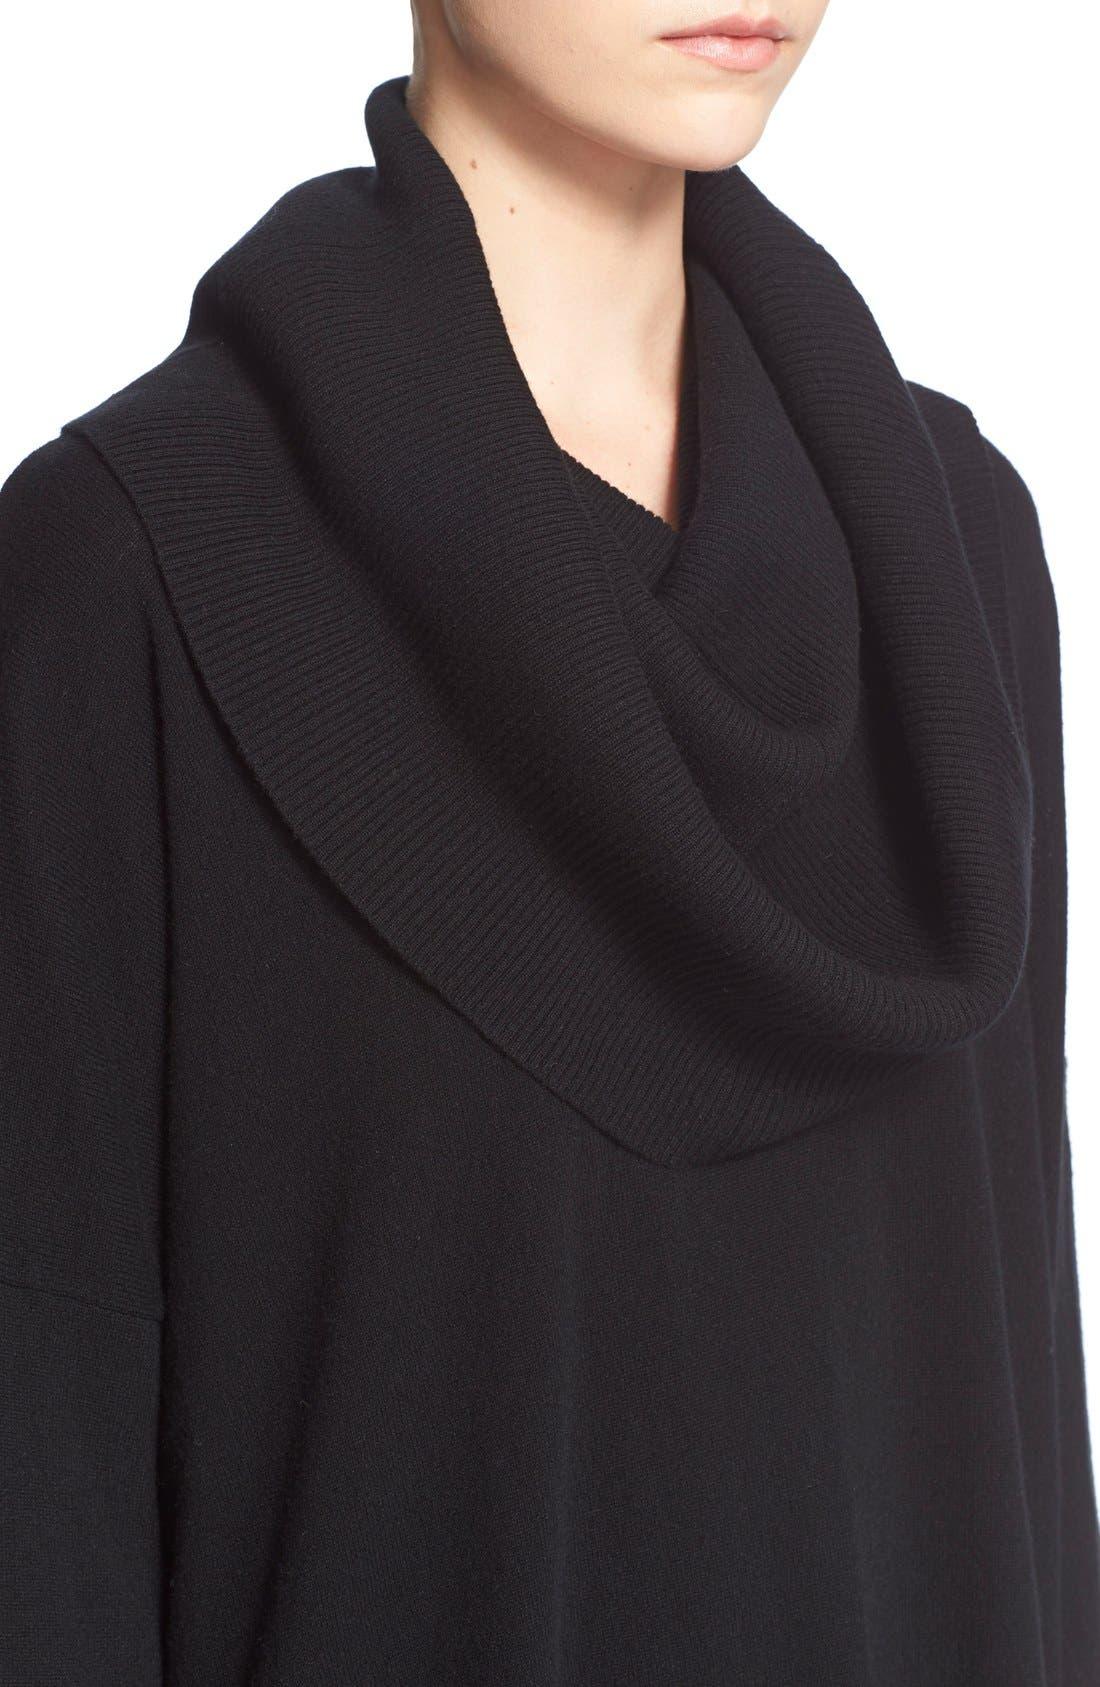 Alternate Image 4  - autumn cashmere Oversized ConvertibleCowl NeckSweater